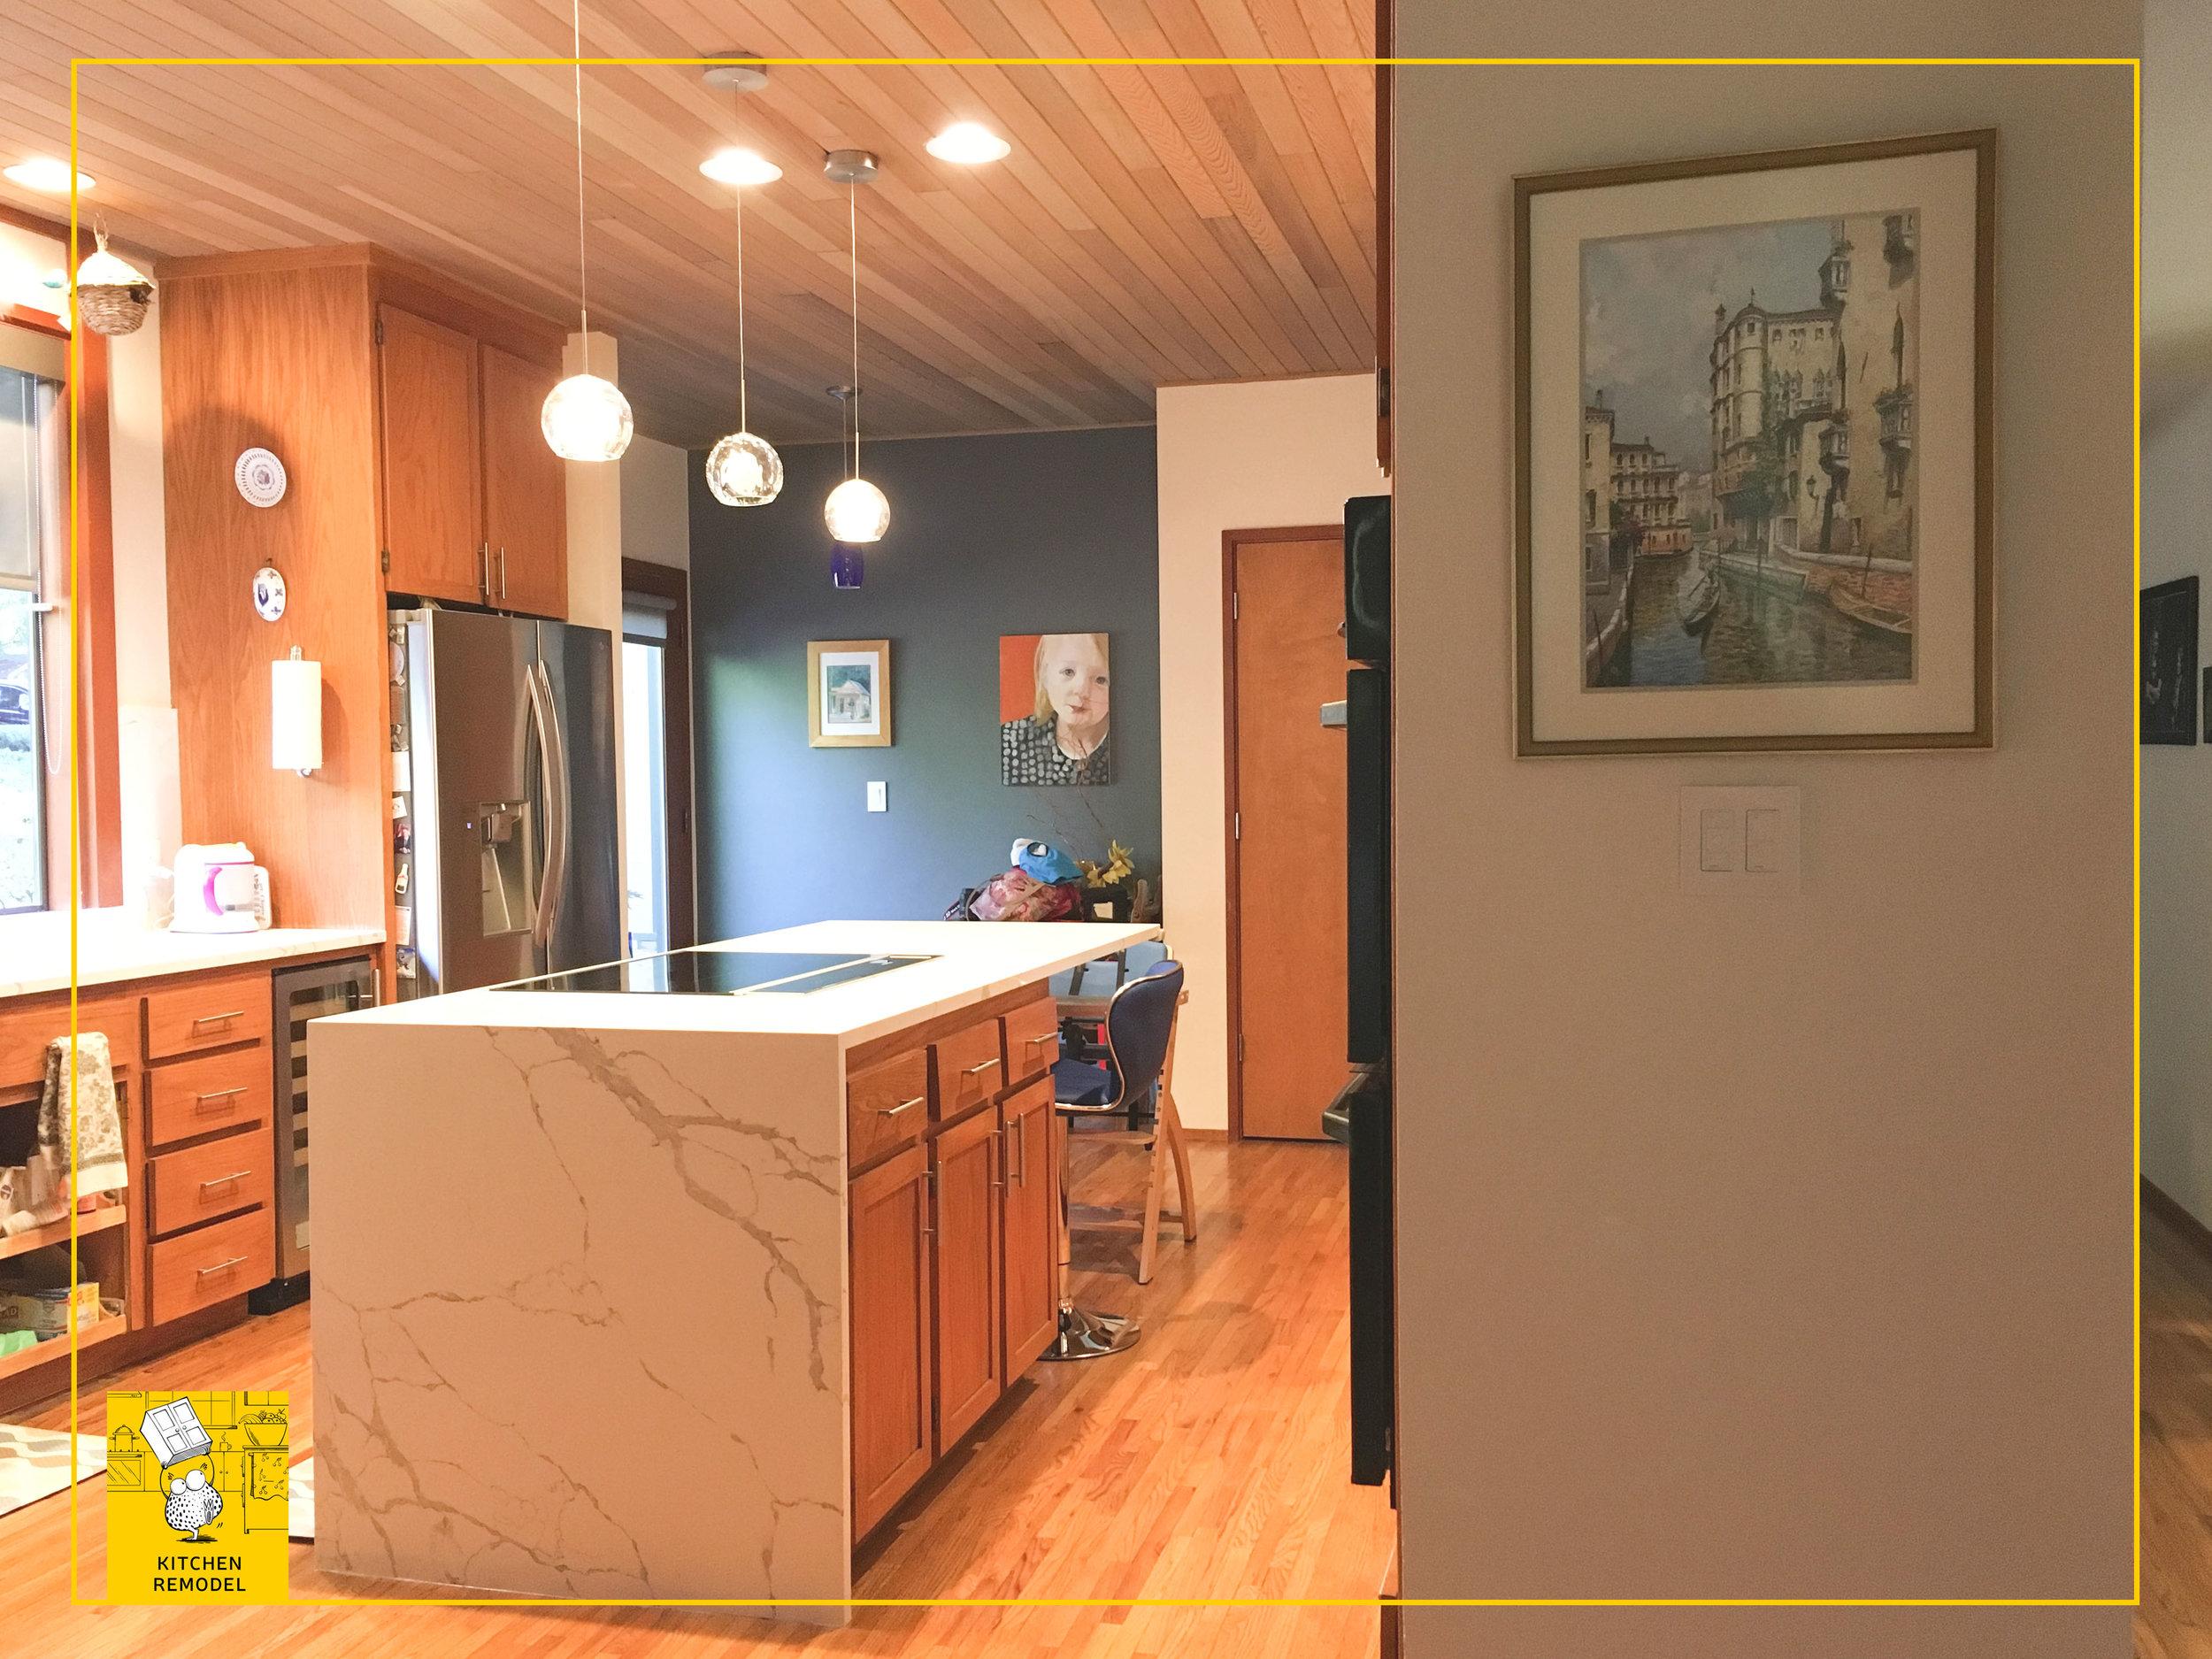 MT family kitchen remodel 08.jpg